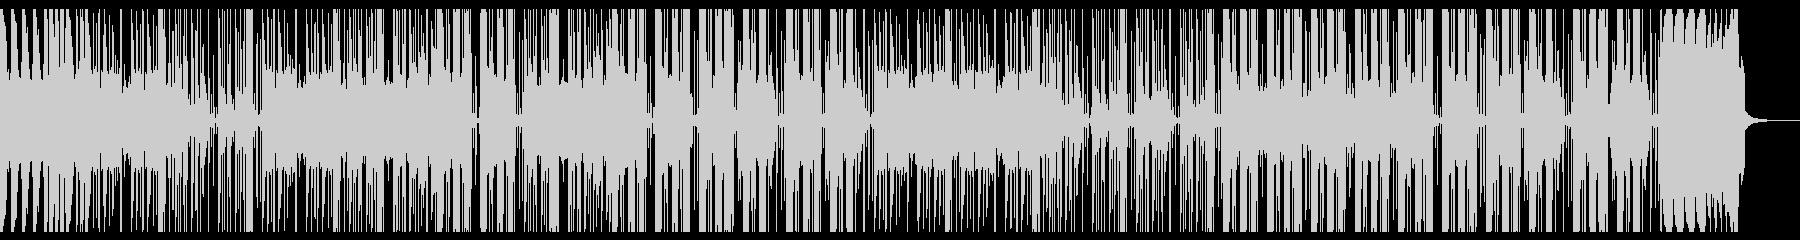 Lo-Fiビート_ファンキー_スイングの未再生の波形